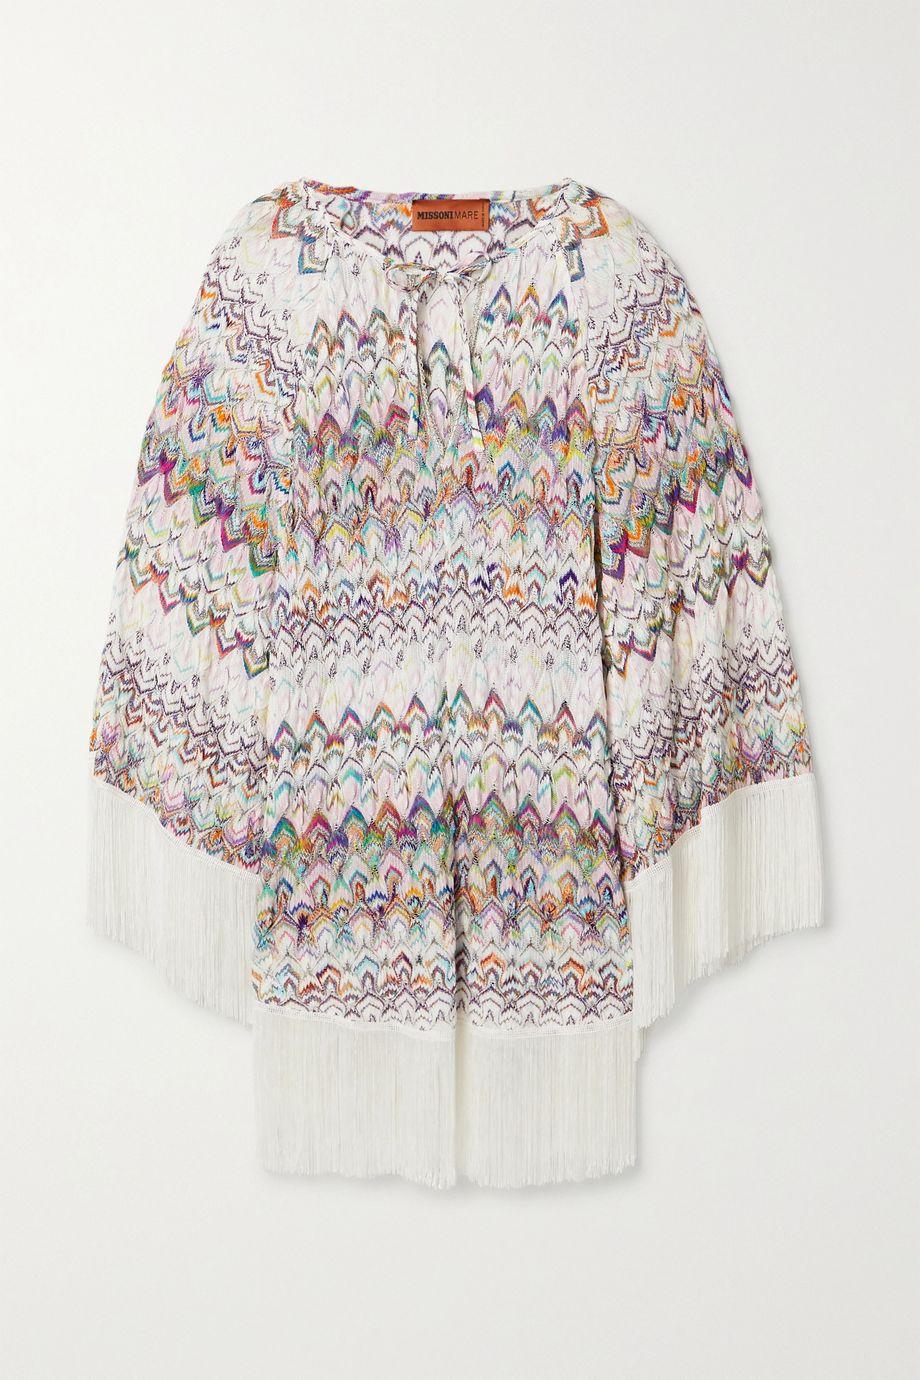 Missoni Mare fringed metallic crochet-knit kaftan